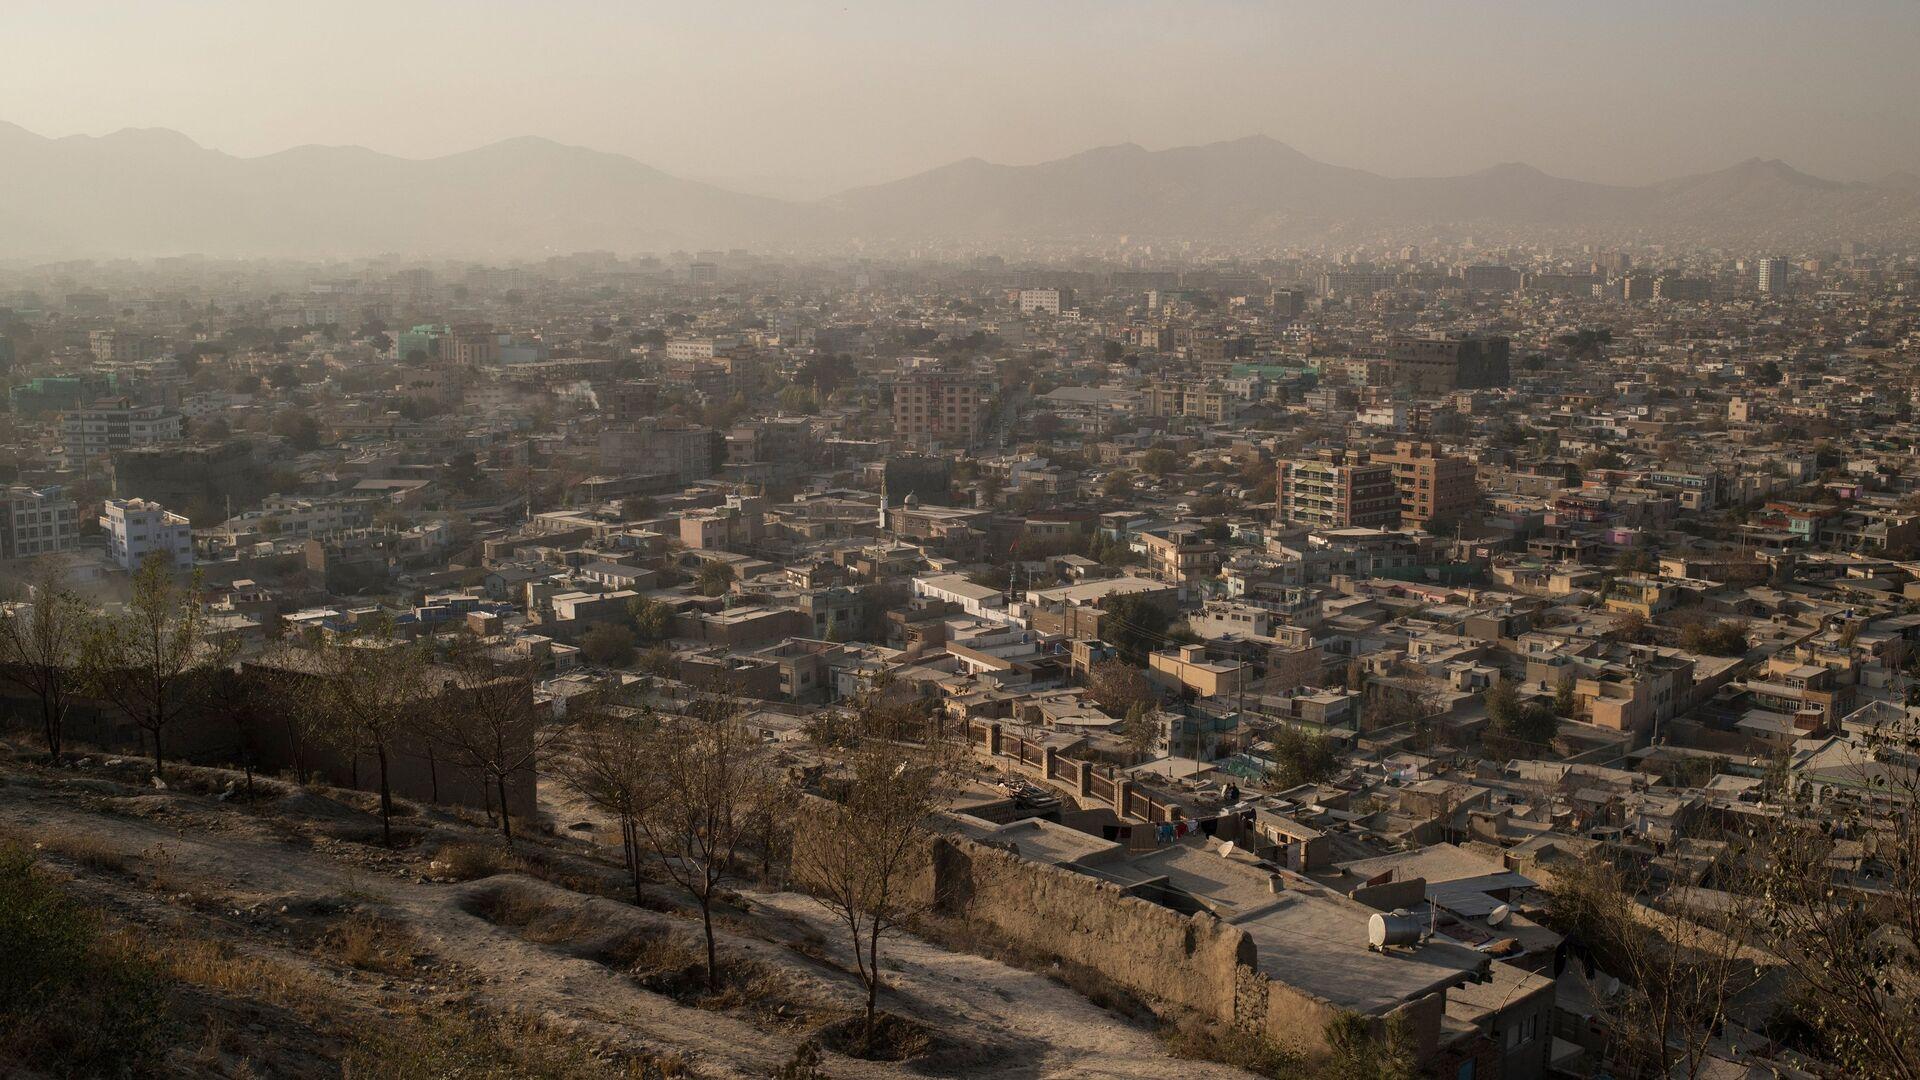 Вид на город Кабул в Афганистане - РИА Новости, 1920, 01.12.2020